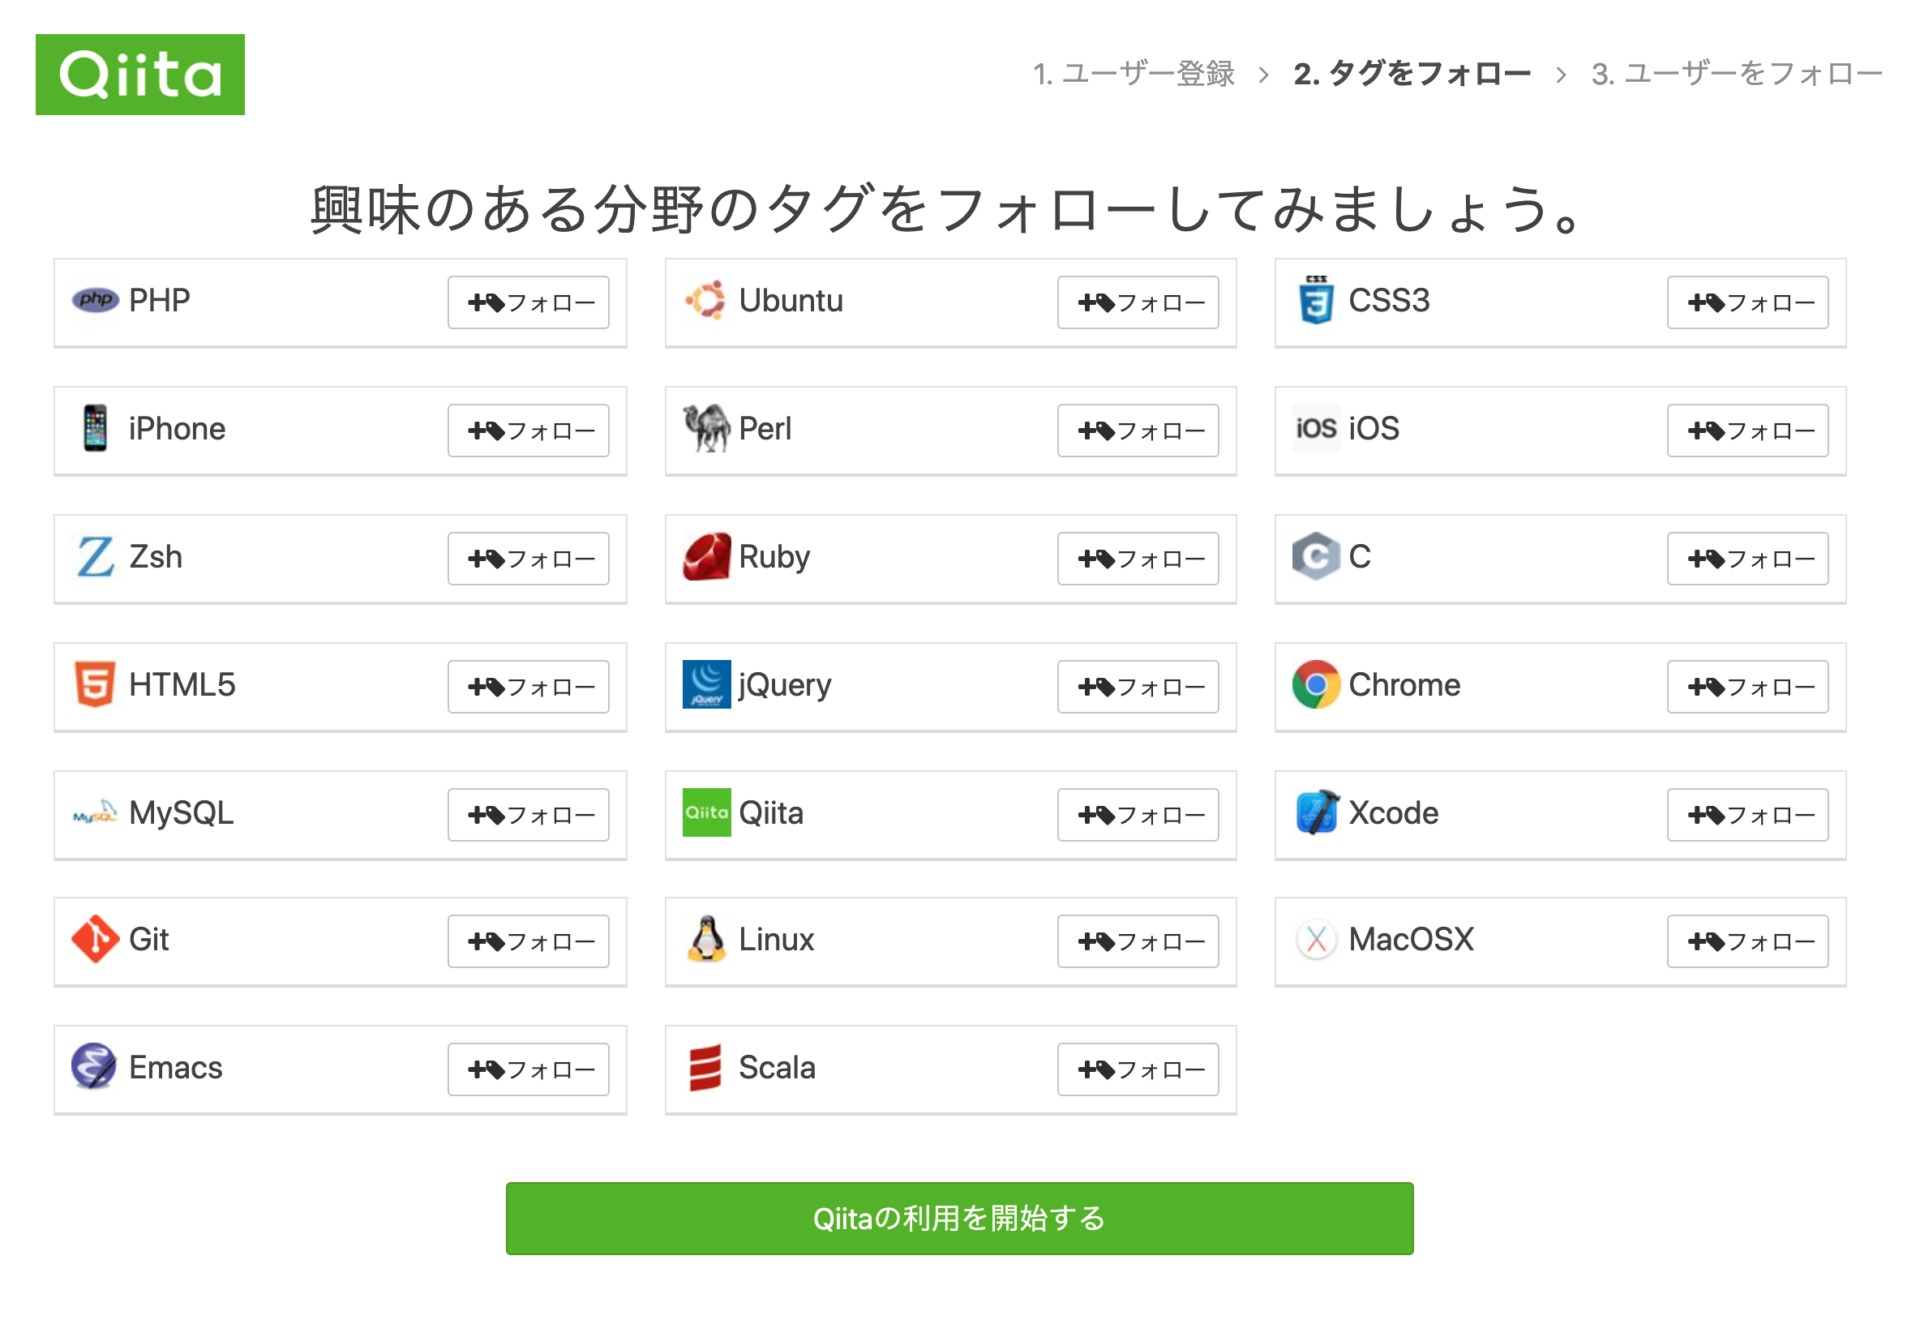 Qiitaの情報選択画面